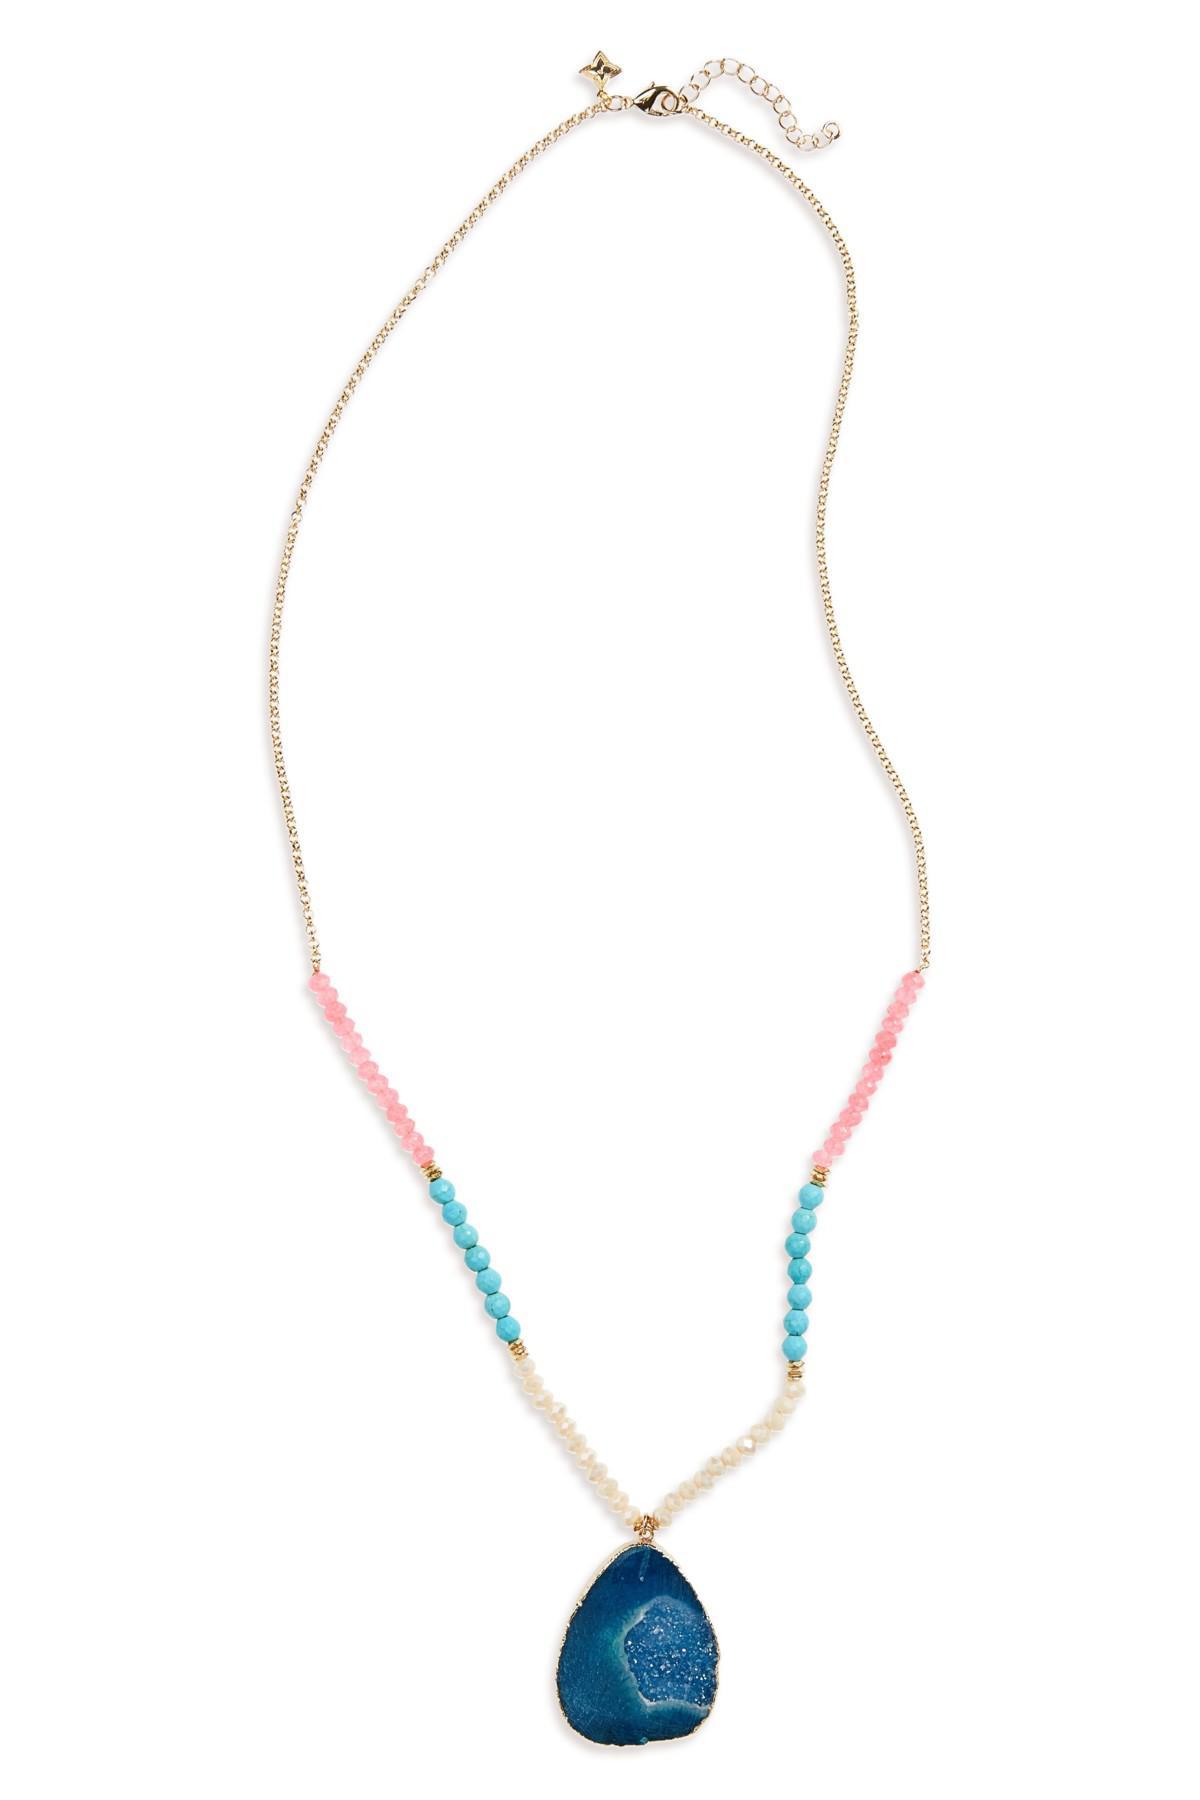 Panacea Multi-Stone Pendant Necklace 3XgB9Oqk1